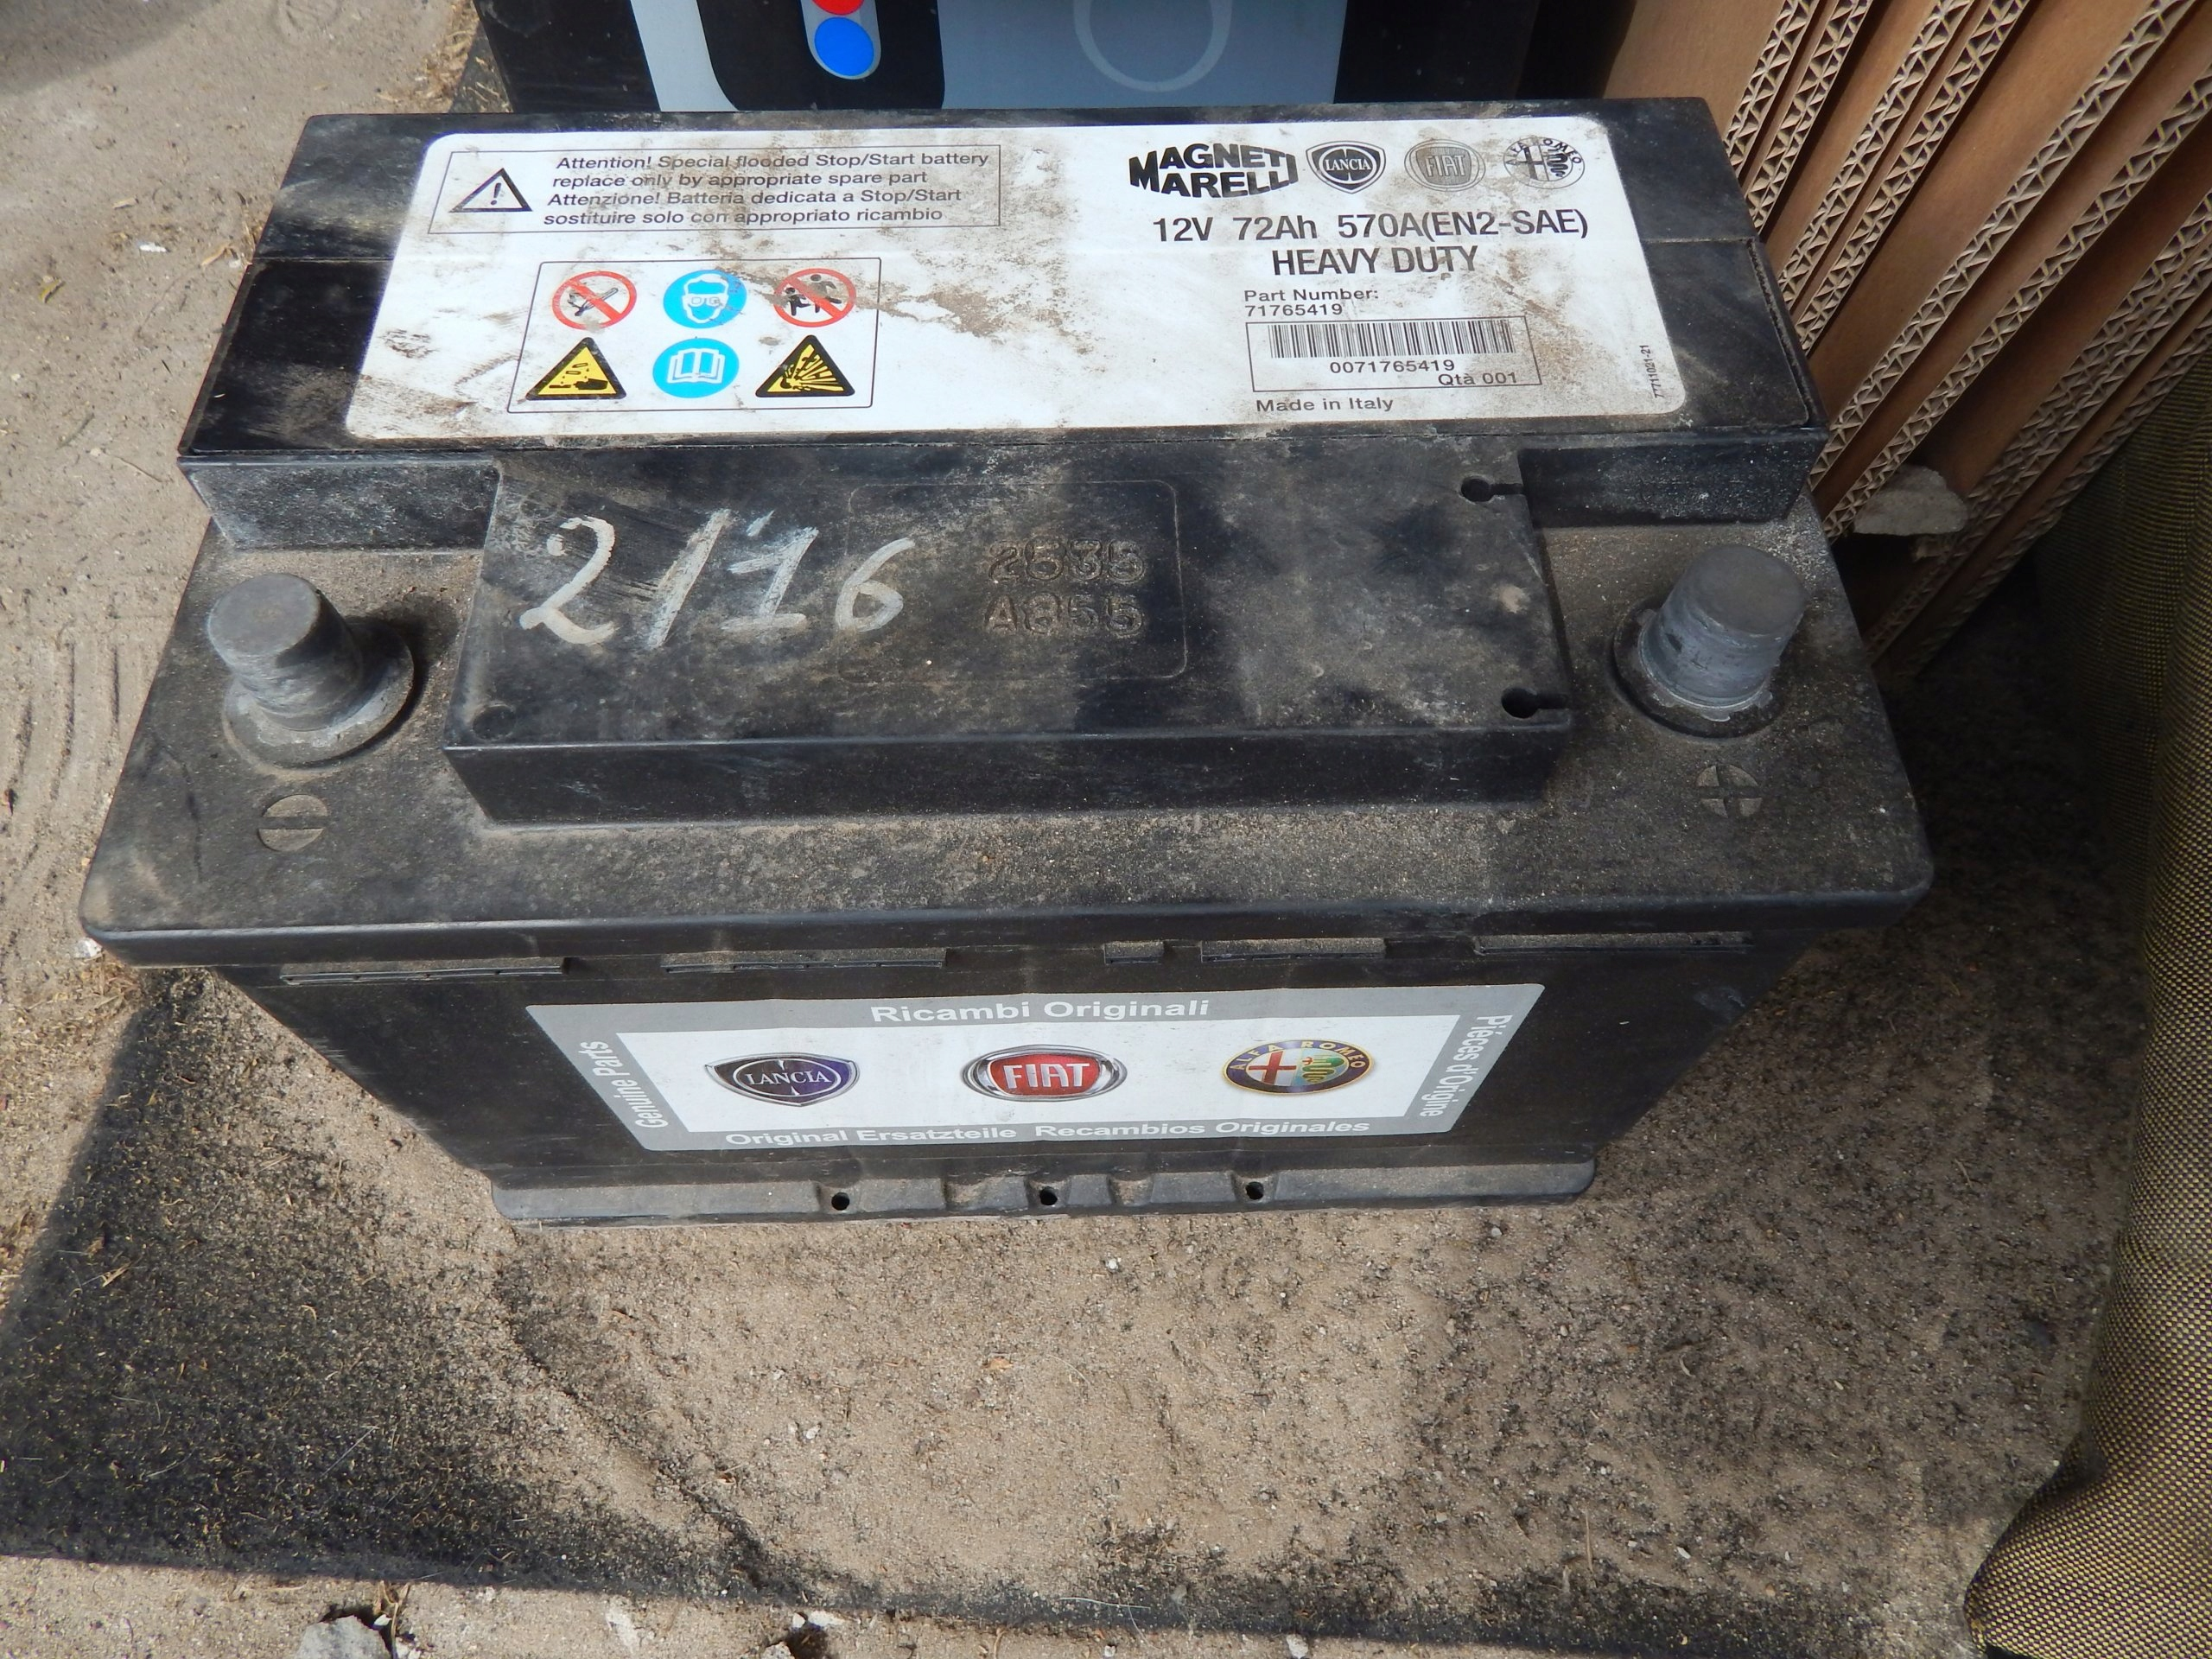 AKUMULATOR 72AH 570A FIAT 500X